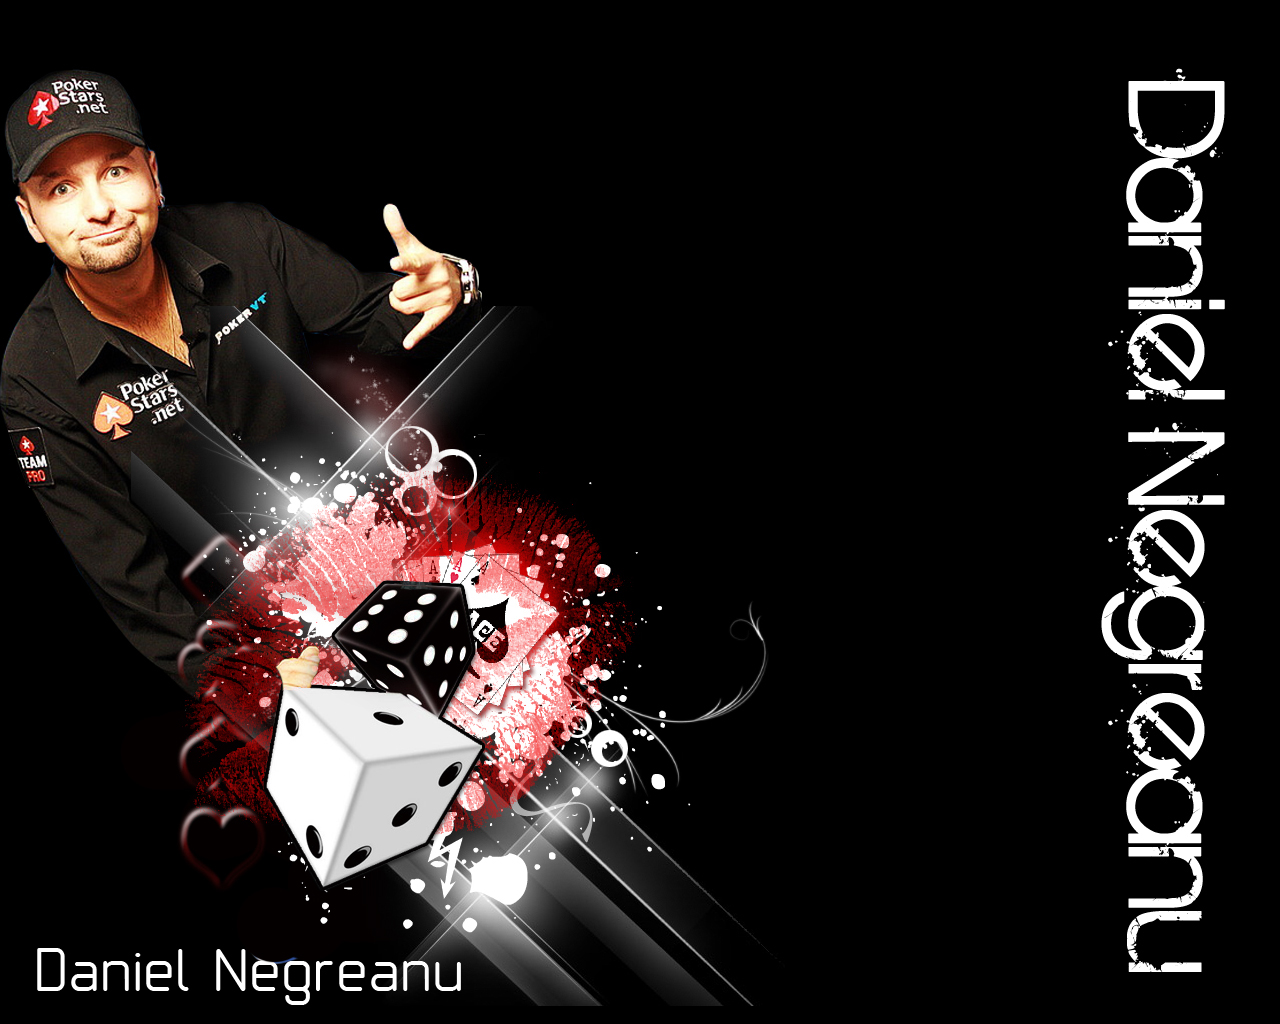 http://3.bp.blogspot.com/-PgQXI3YKH3c/UOWP6DmLksI/AAAAAAAAAMM/MJxrWIdcXIE/s1600/Daniel+Negreanu+Wallpaper.jpg